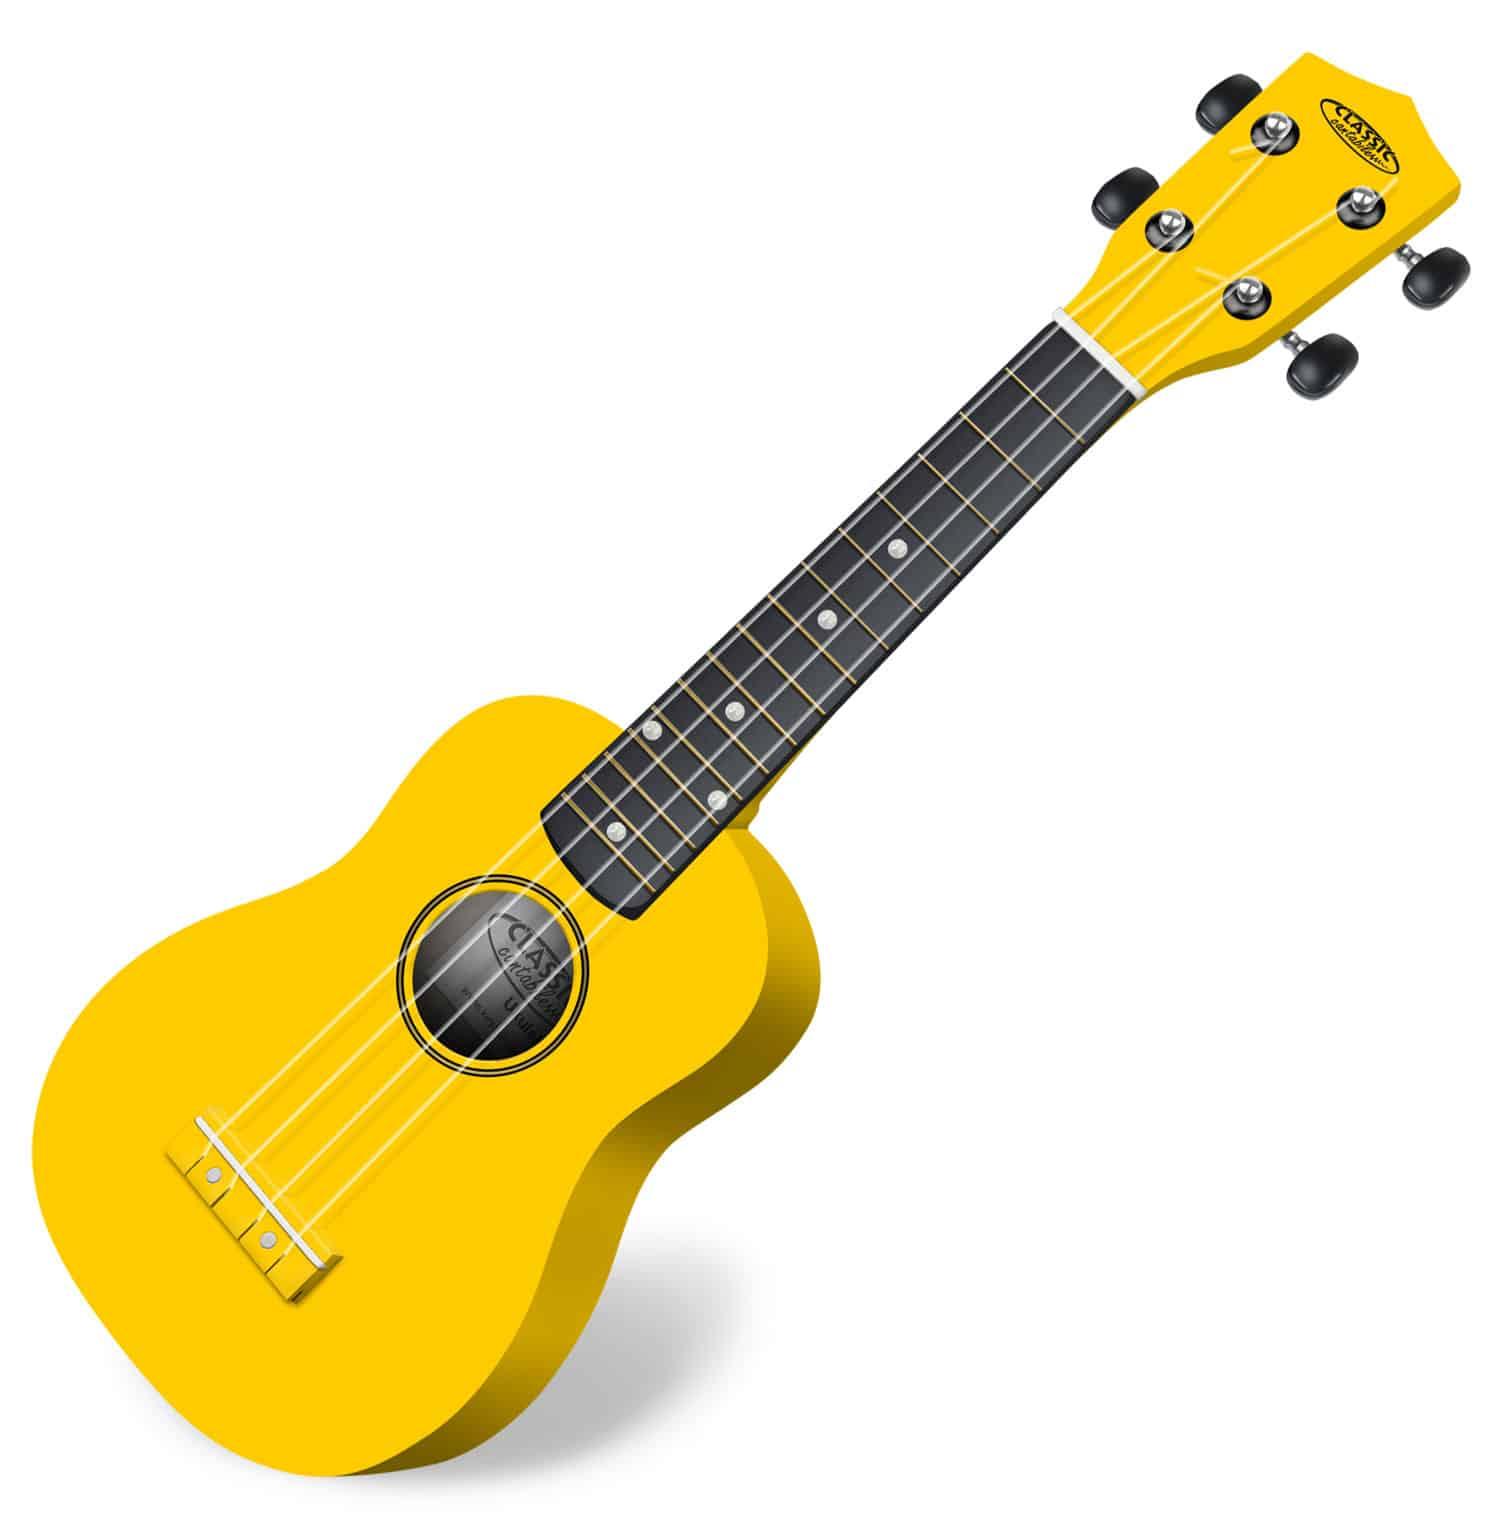 sertaphardi.ml: Specializing in books for learning guitar, mandolin, banjo, flute, jazz, tinwhistle, Mel Bay, dulcimer, guitar lesson, music books, flamenco, banjo.